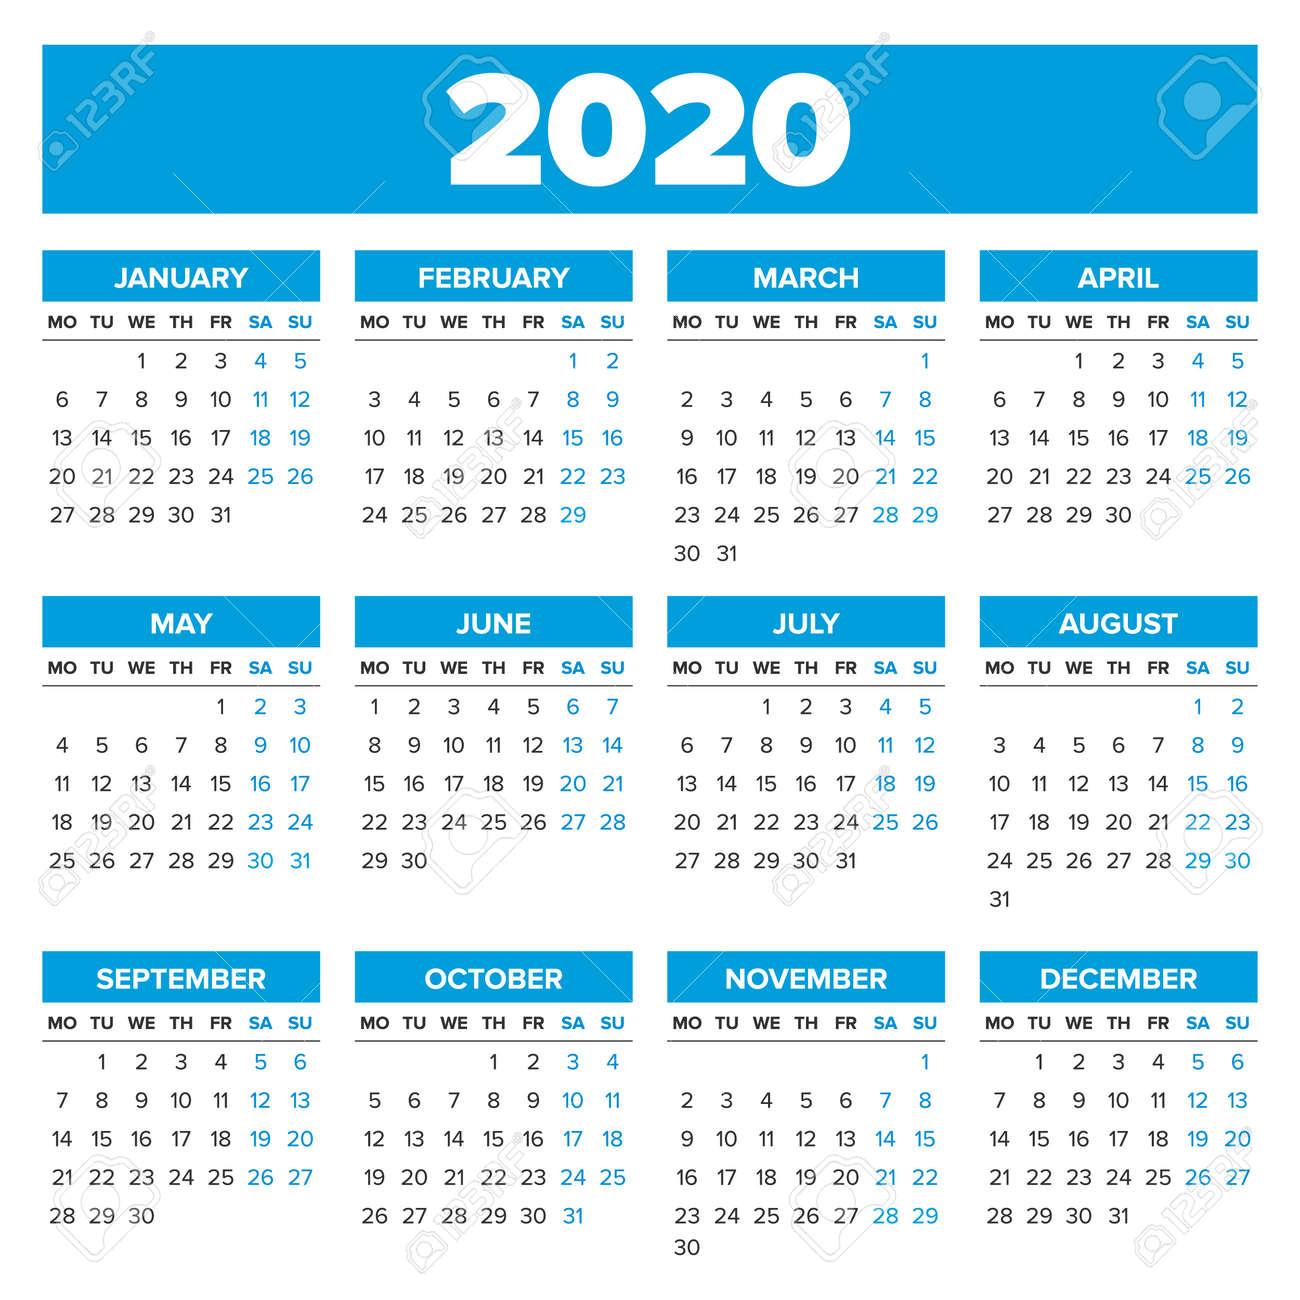 Calendrier Semaines 2020.Calendrier Simple De L Annee 2020 La Semaine Commence Le Lundi